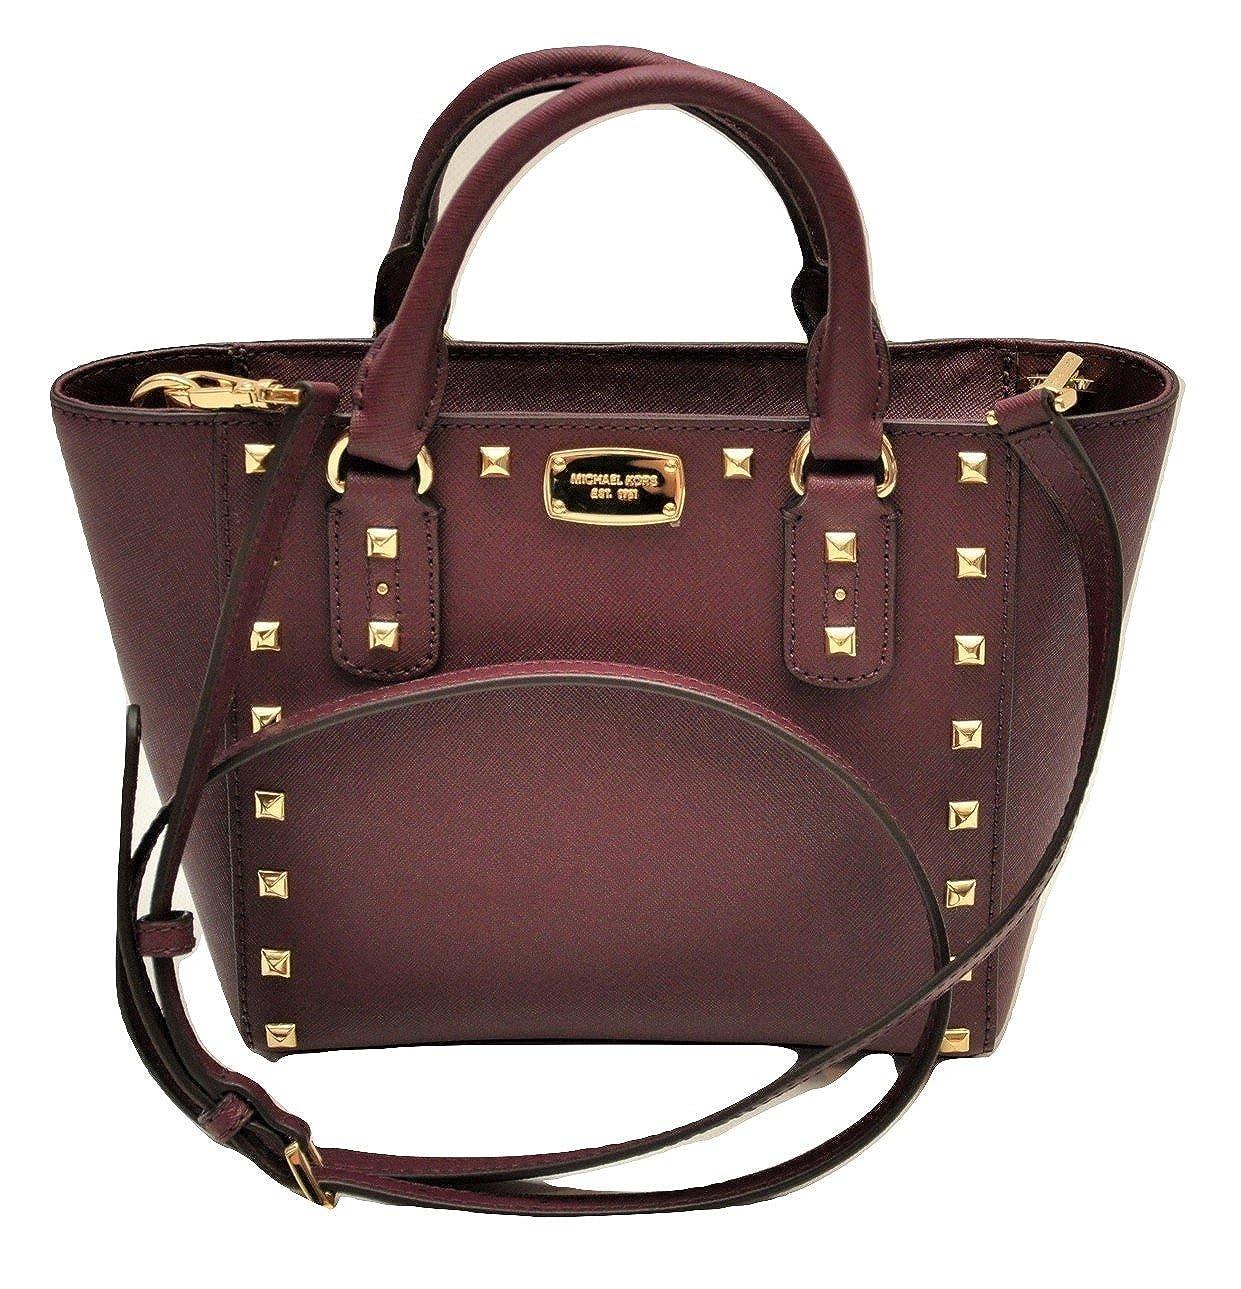 c5901ff23b Michael Kors Sandrine Stud Small Crossbody Saffiano Leather Bag Handbag ( Plum)  Amazon.co.uk  Shoes   Bags